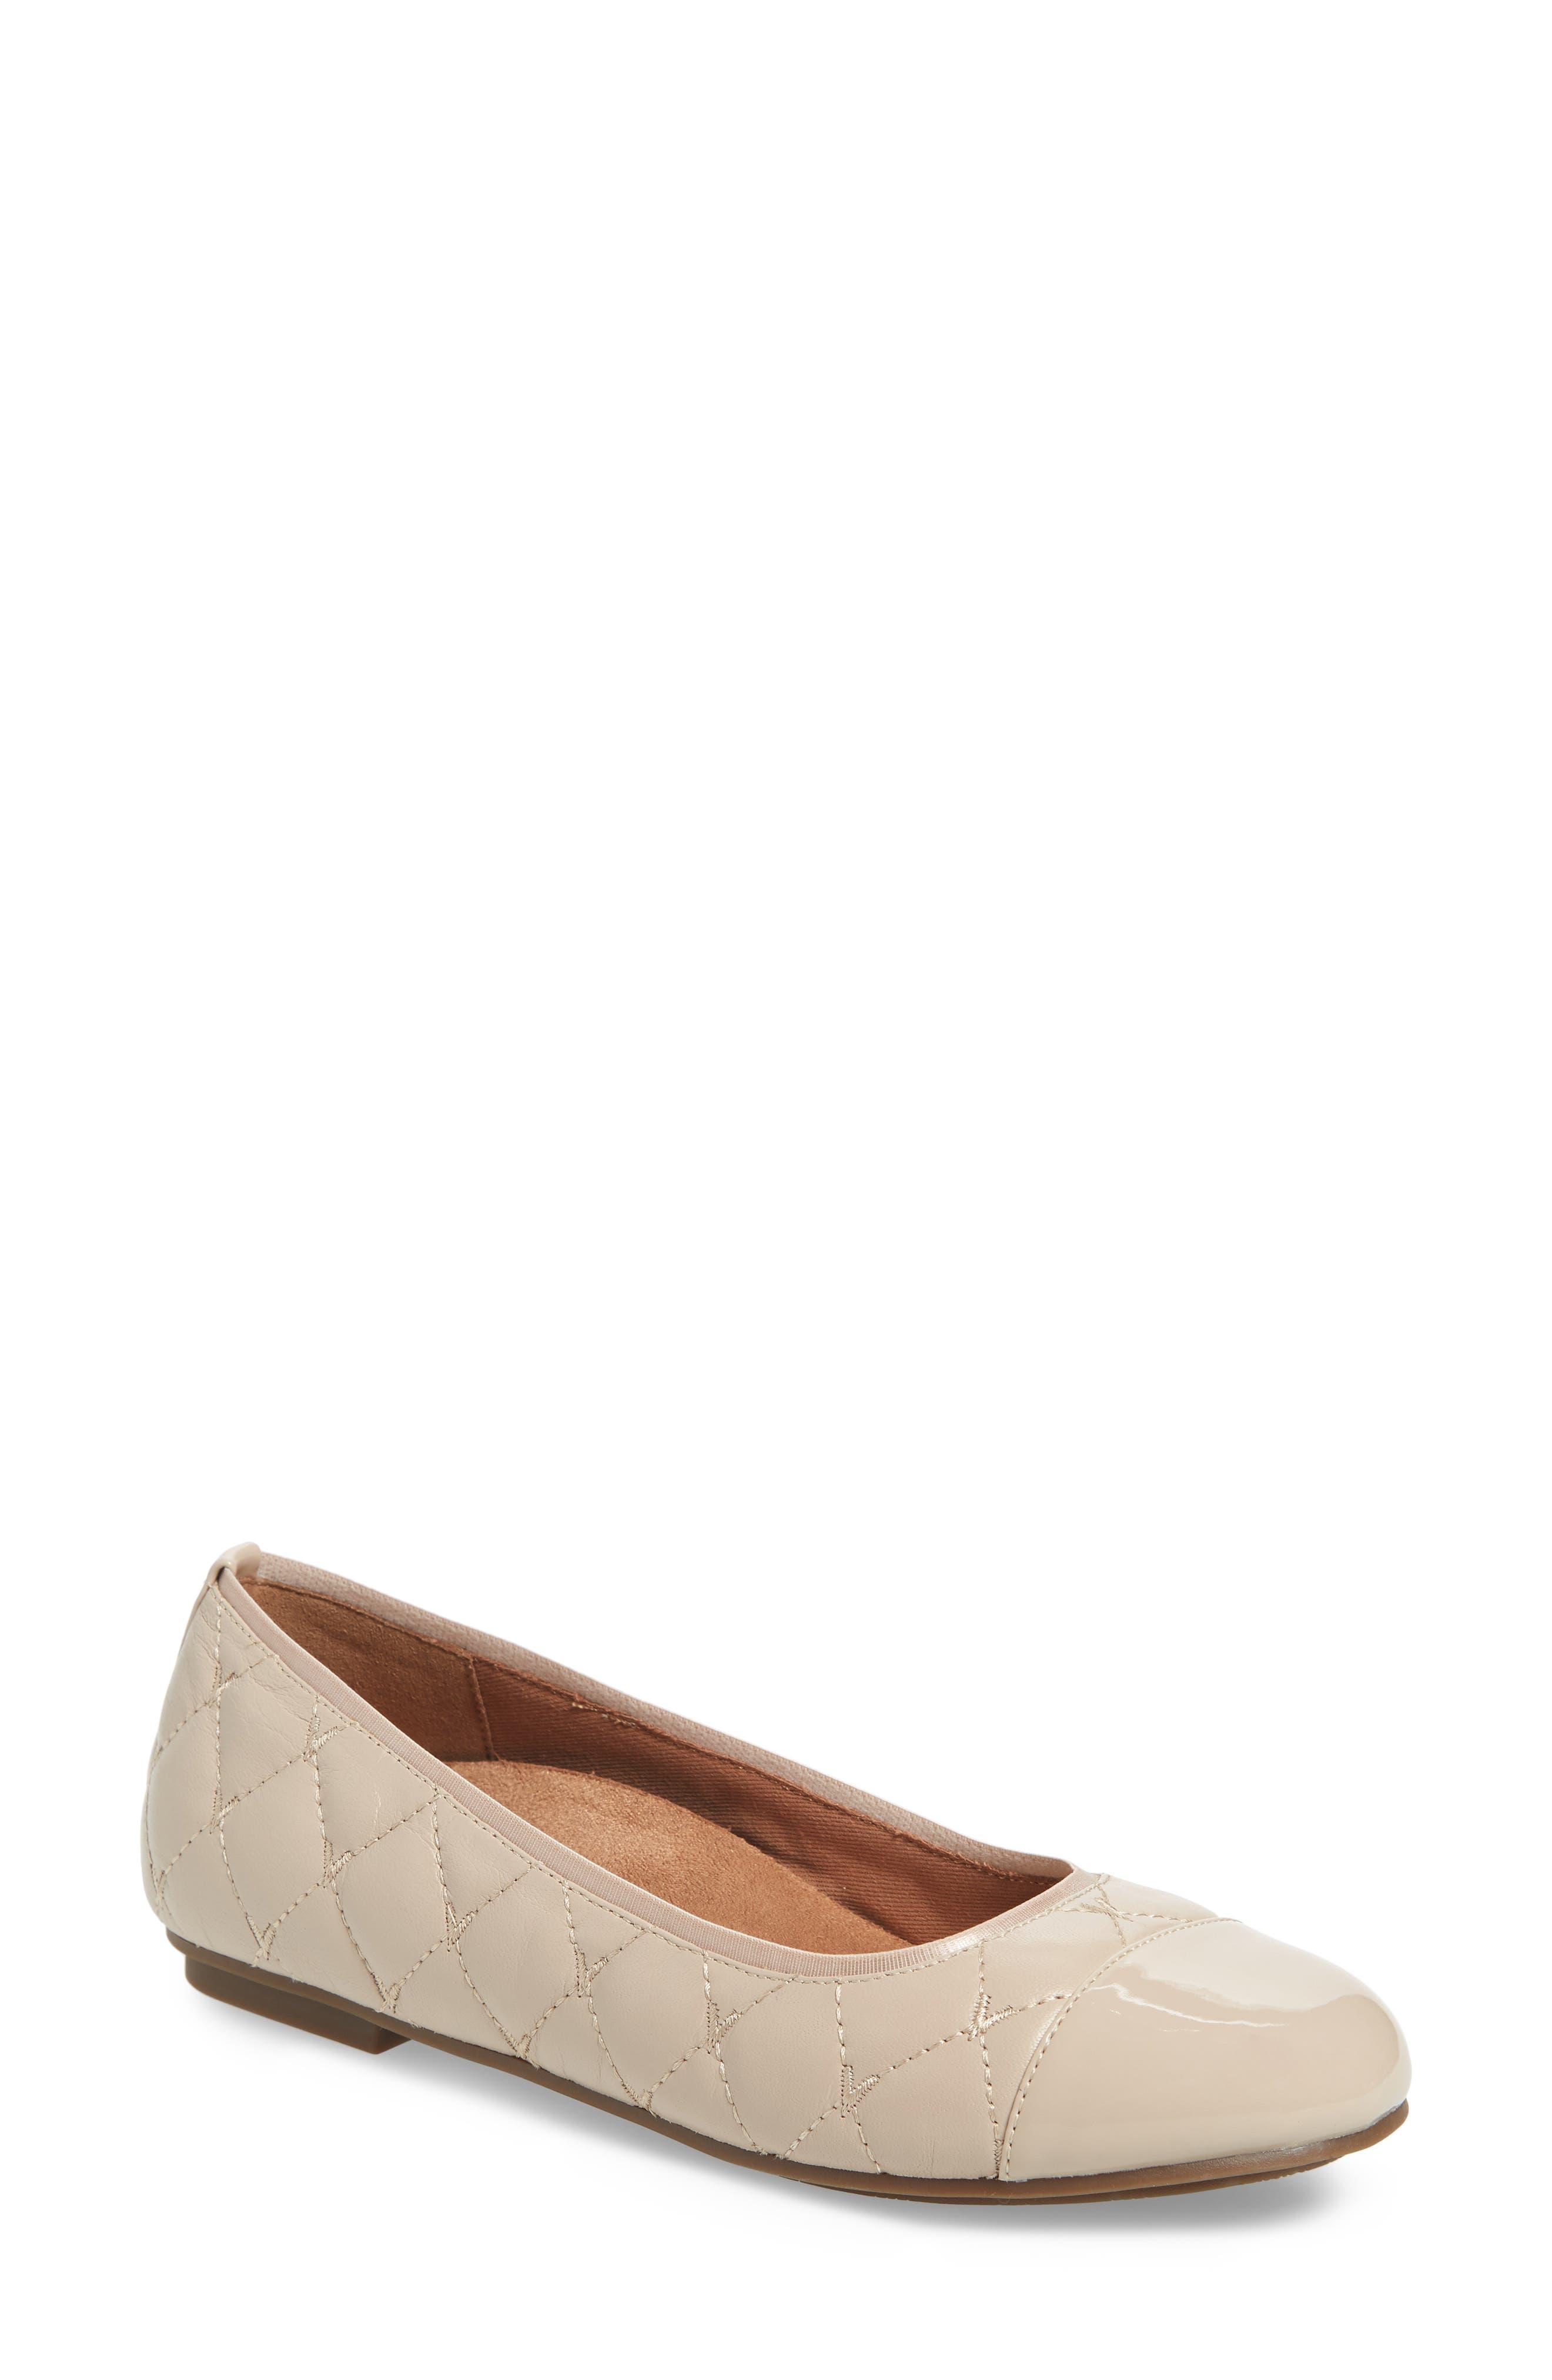 Women's Vionic Shoes Sale \u0026 Clearance